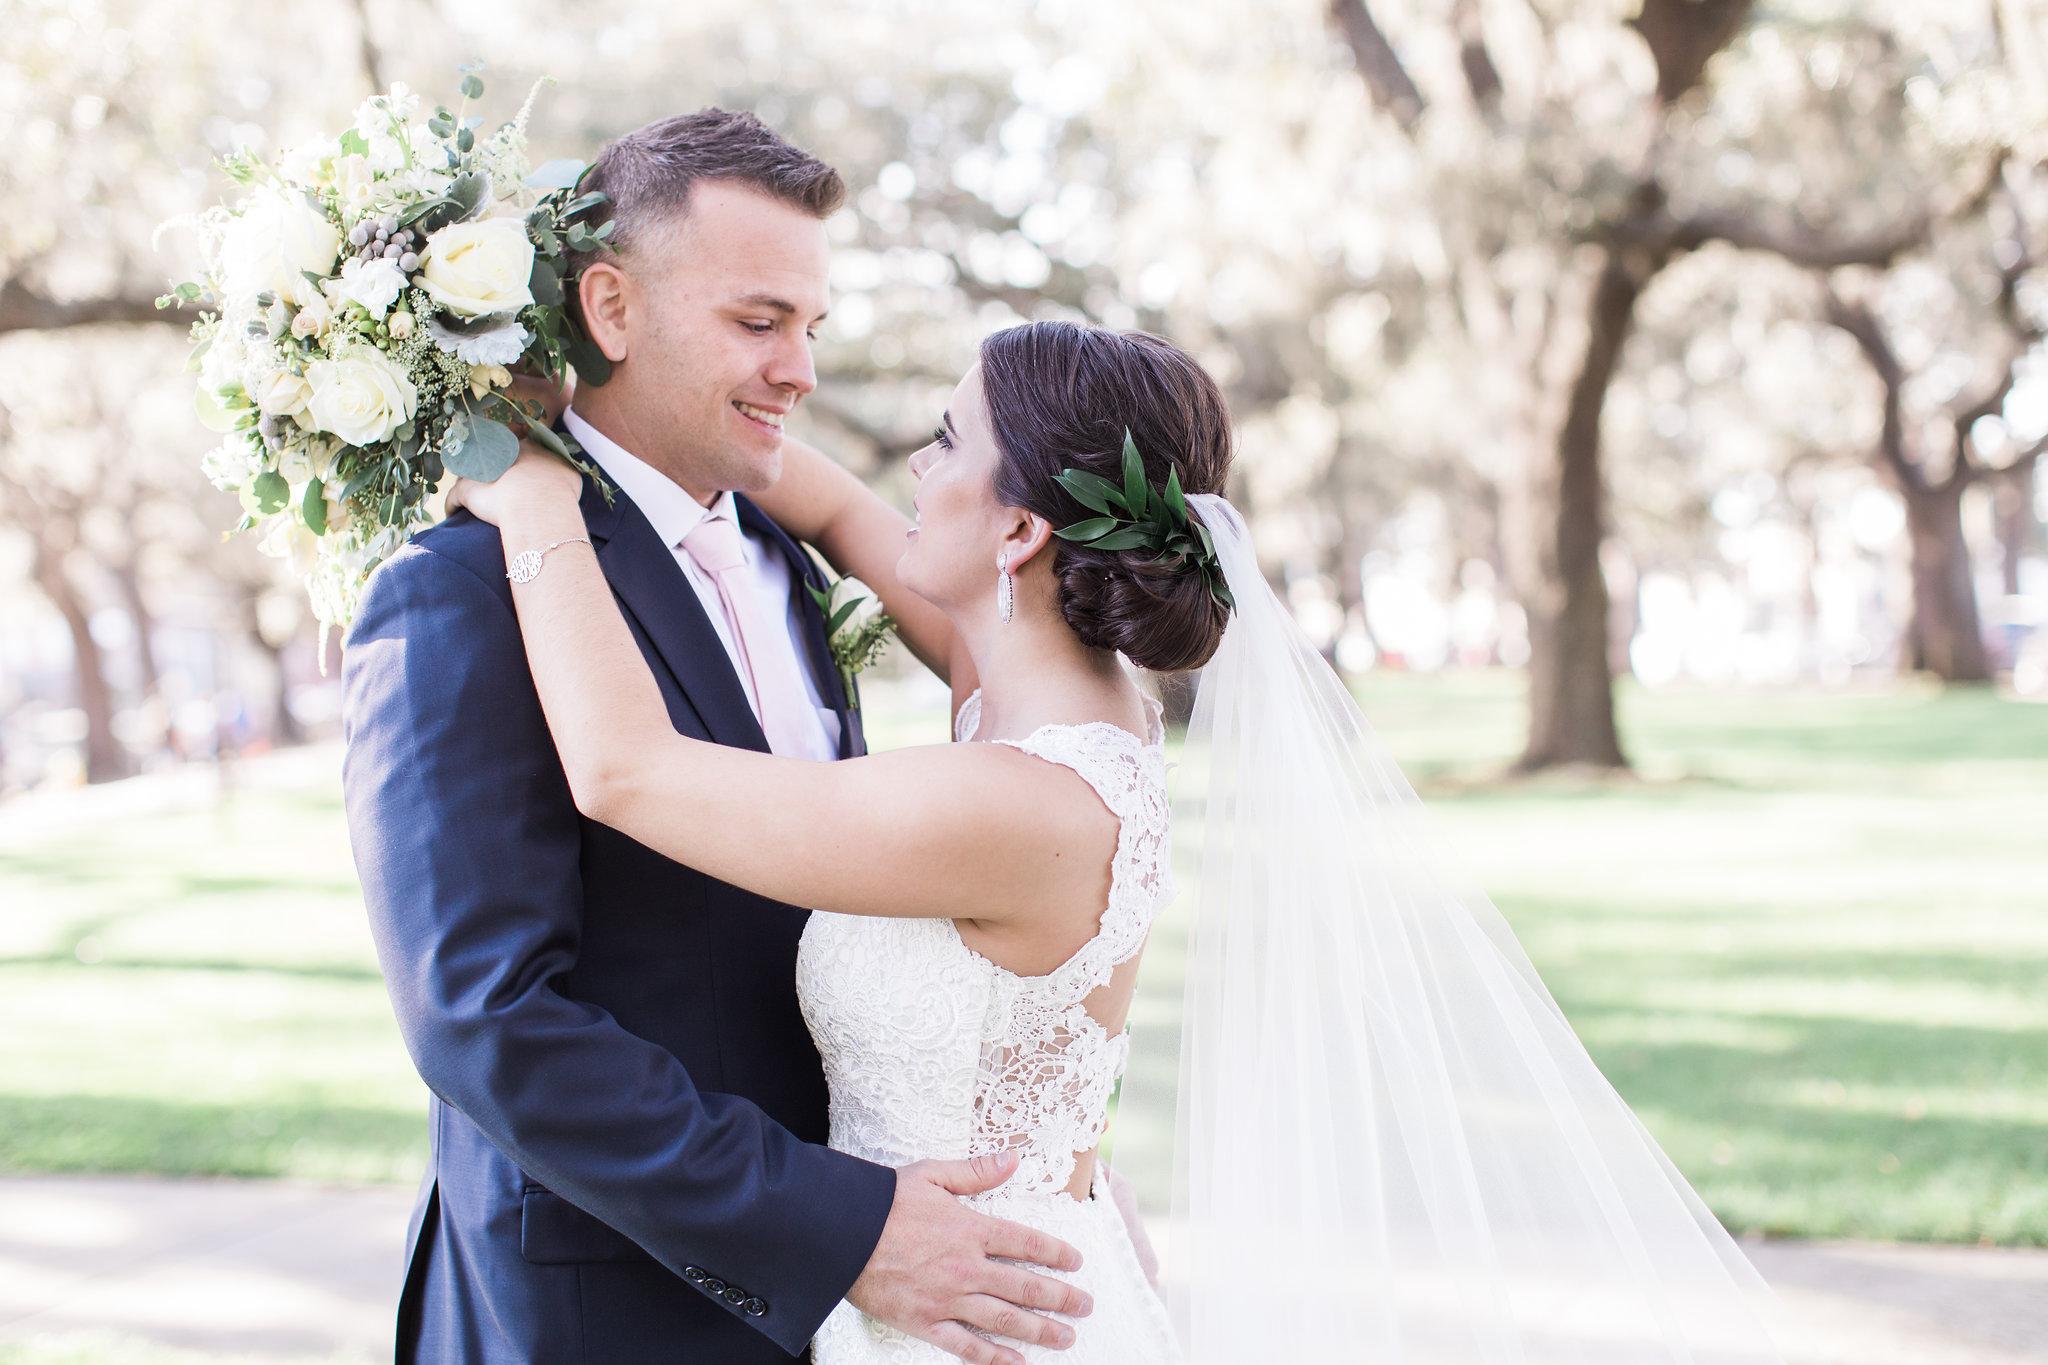 apt-b-photography-Savannah-wedding-photographer-savannah-engagement-photographer-historic-savannah-engagement-charles-h-morris-center-wedding-savannah-weddings-18.JPG